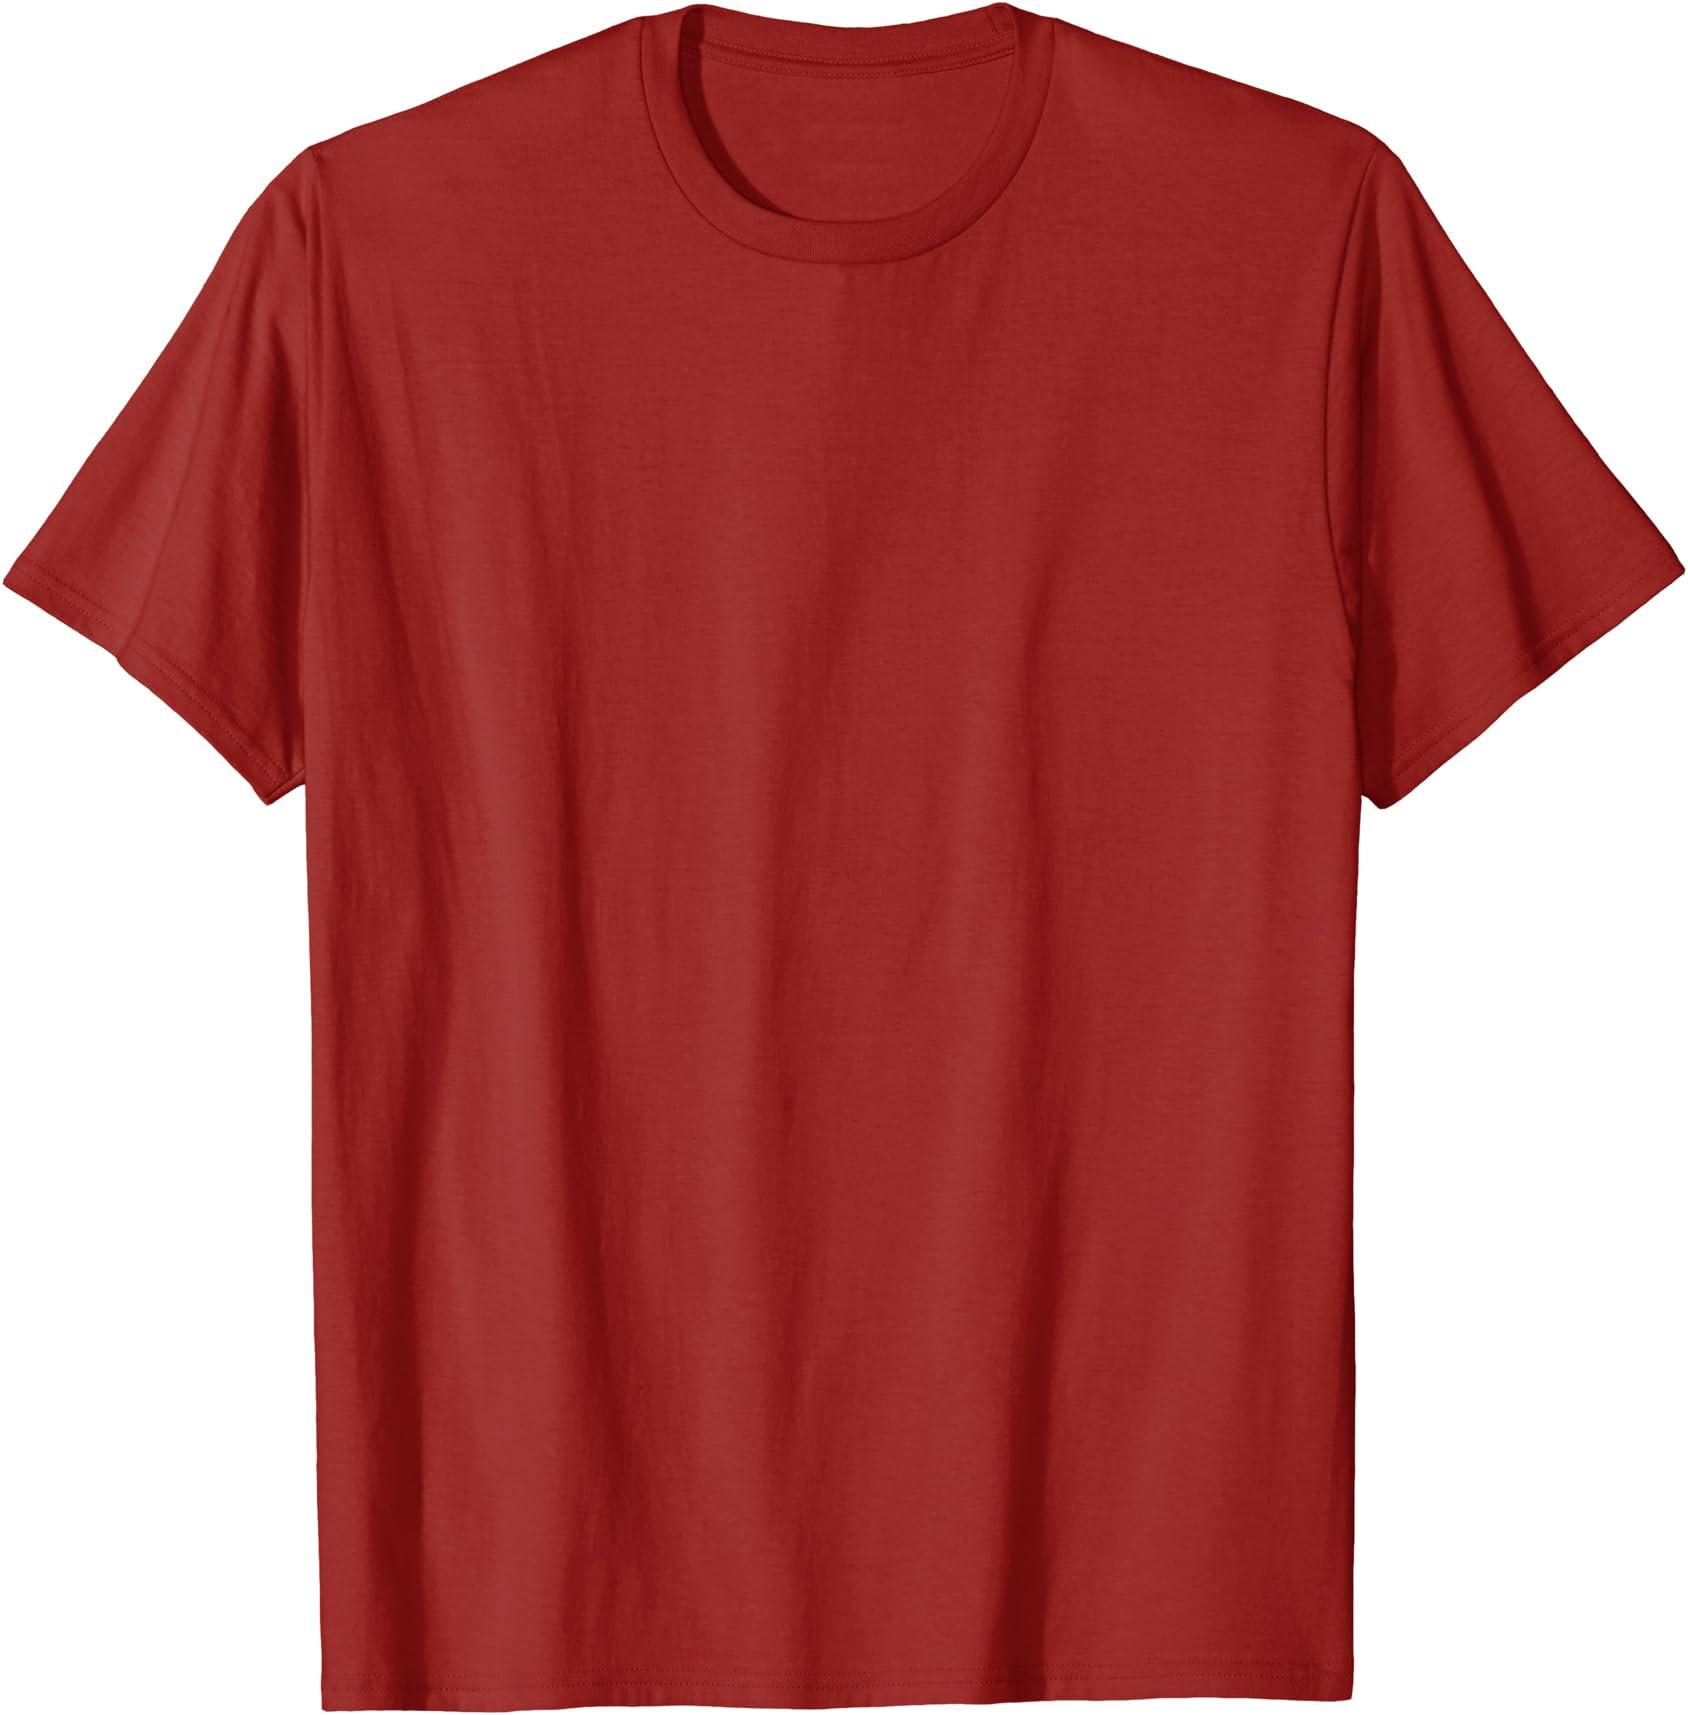 Rugby T-Shirt Funny Novelty Mens tee TShirt Ruck Me Maul Me Make Me Scrum